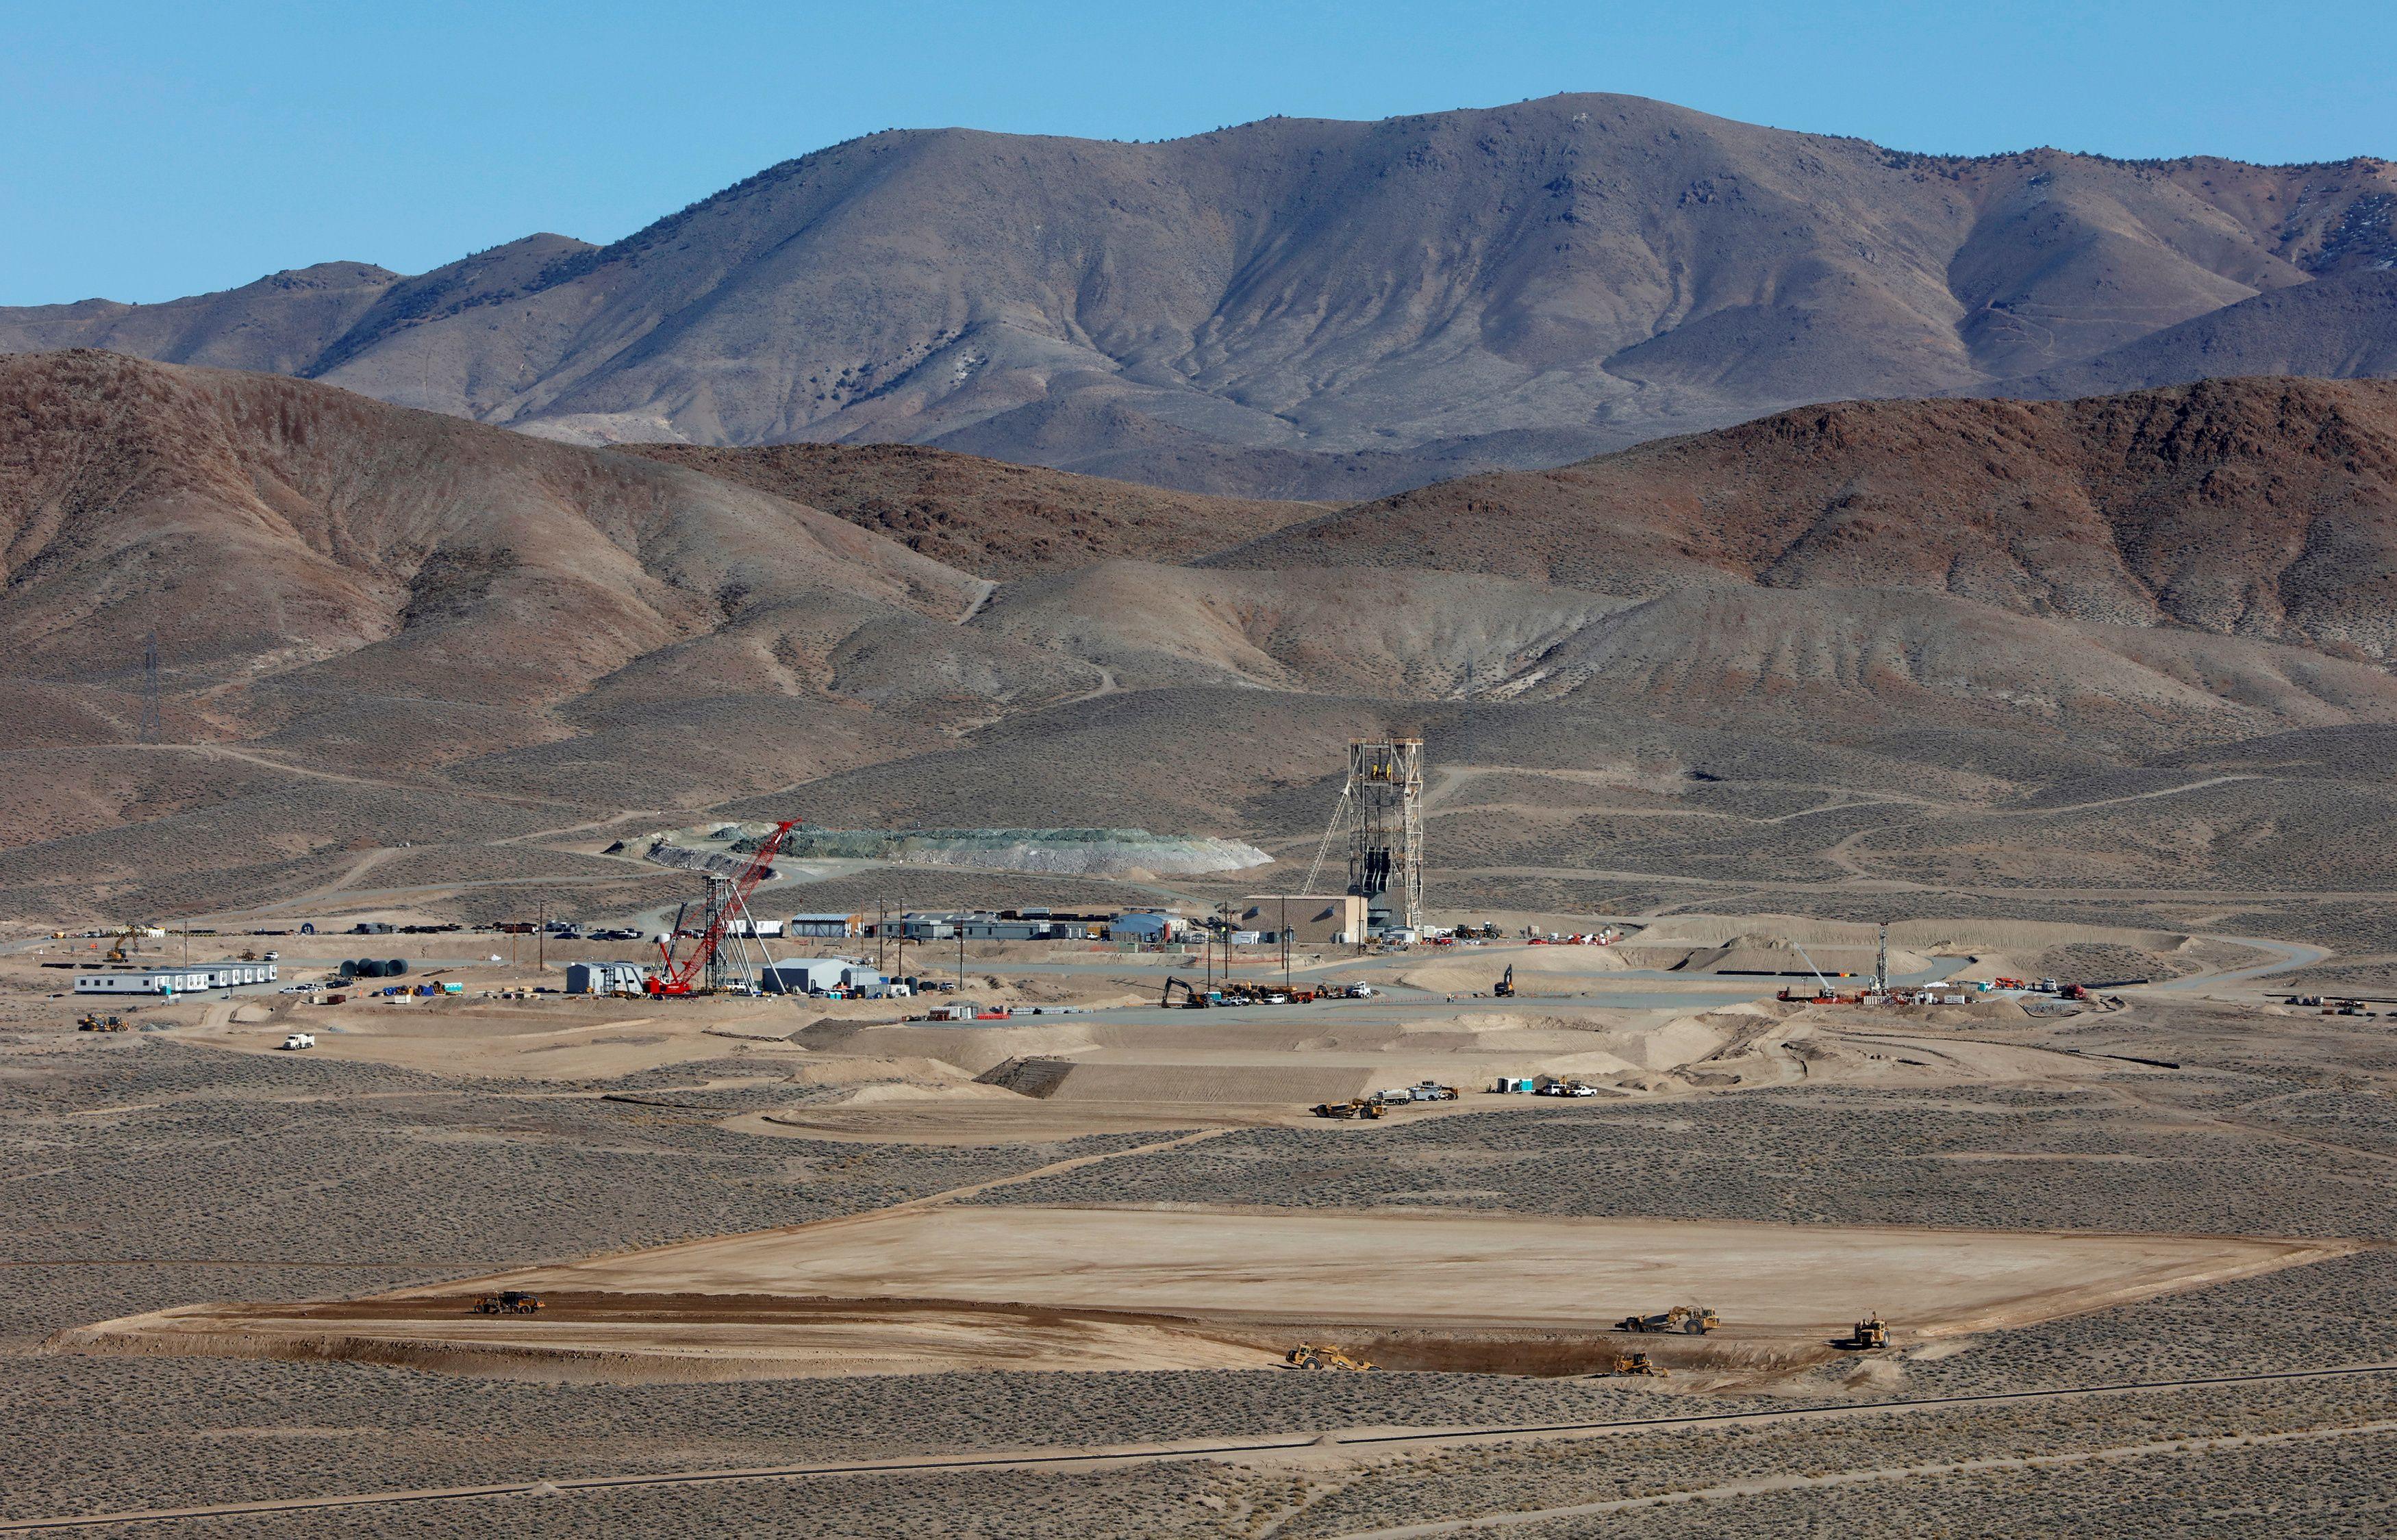 General view of Nevada Copper's Pumpkin Hollow copper mine in Yerington, Nevada, U.S., January 10, 2019. REUTERS/Bob Strong